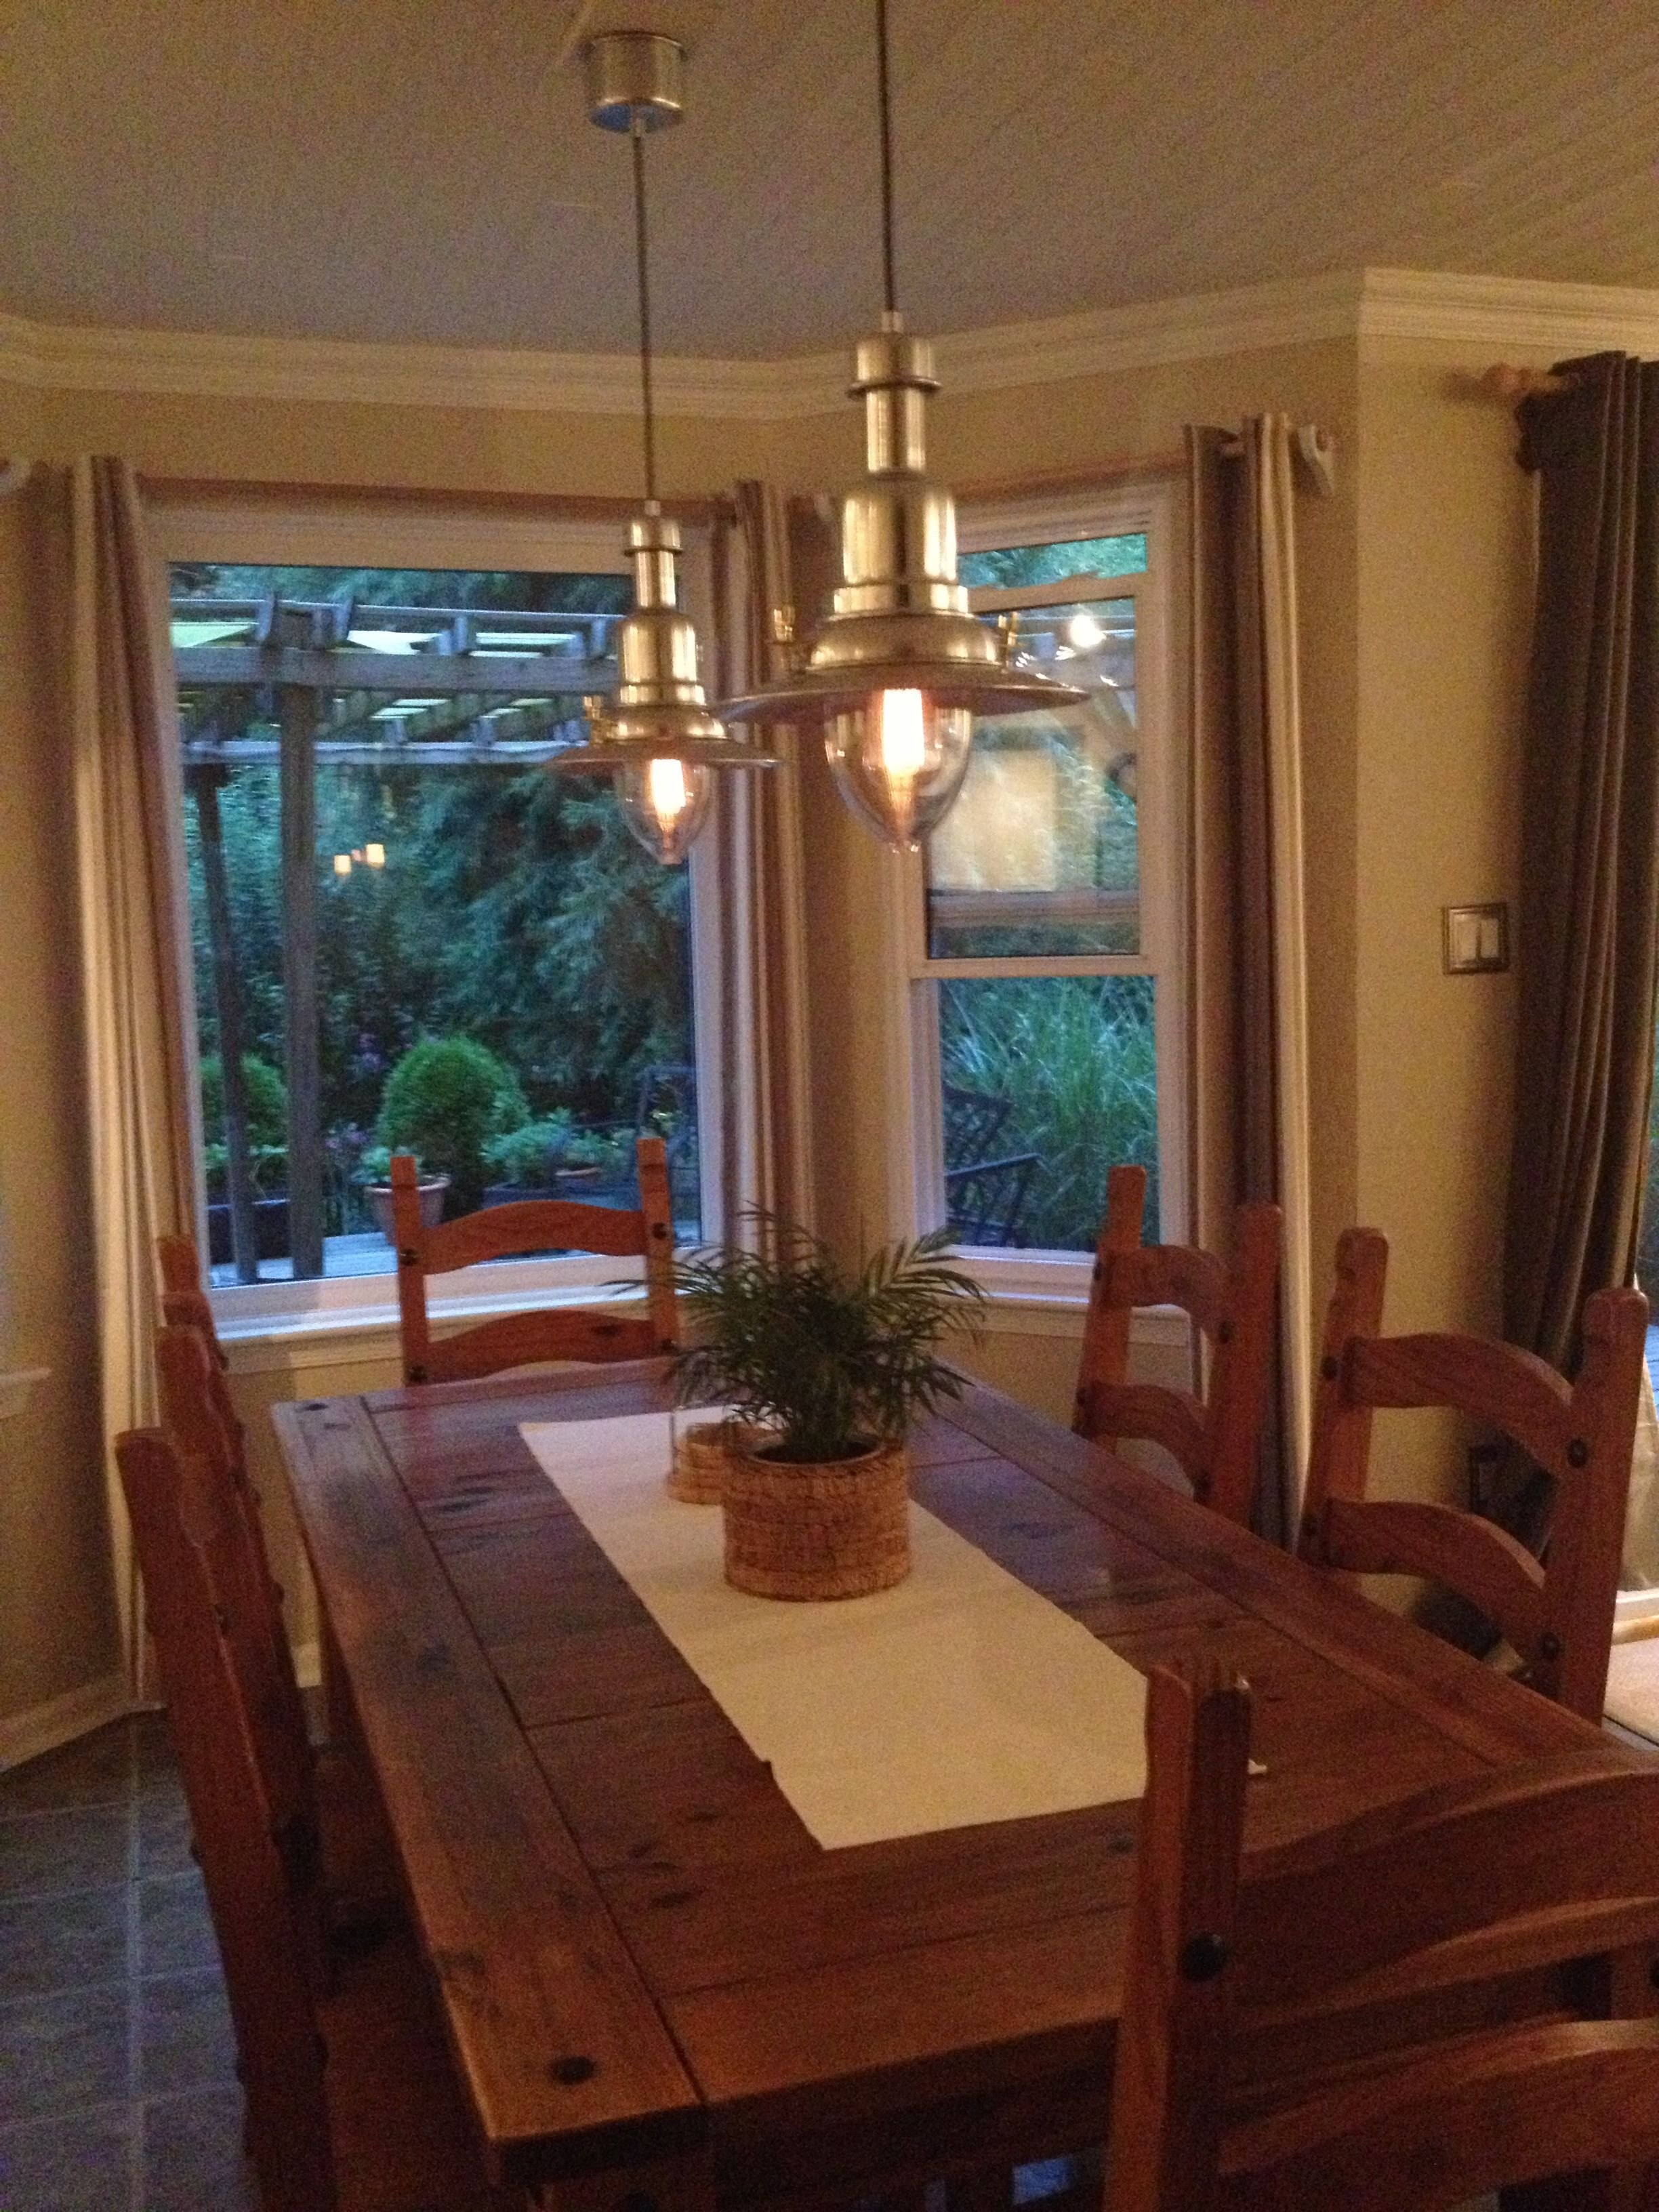 lighting over kitchen table backslash in share